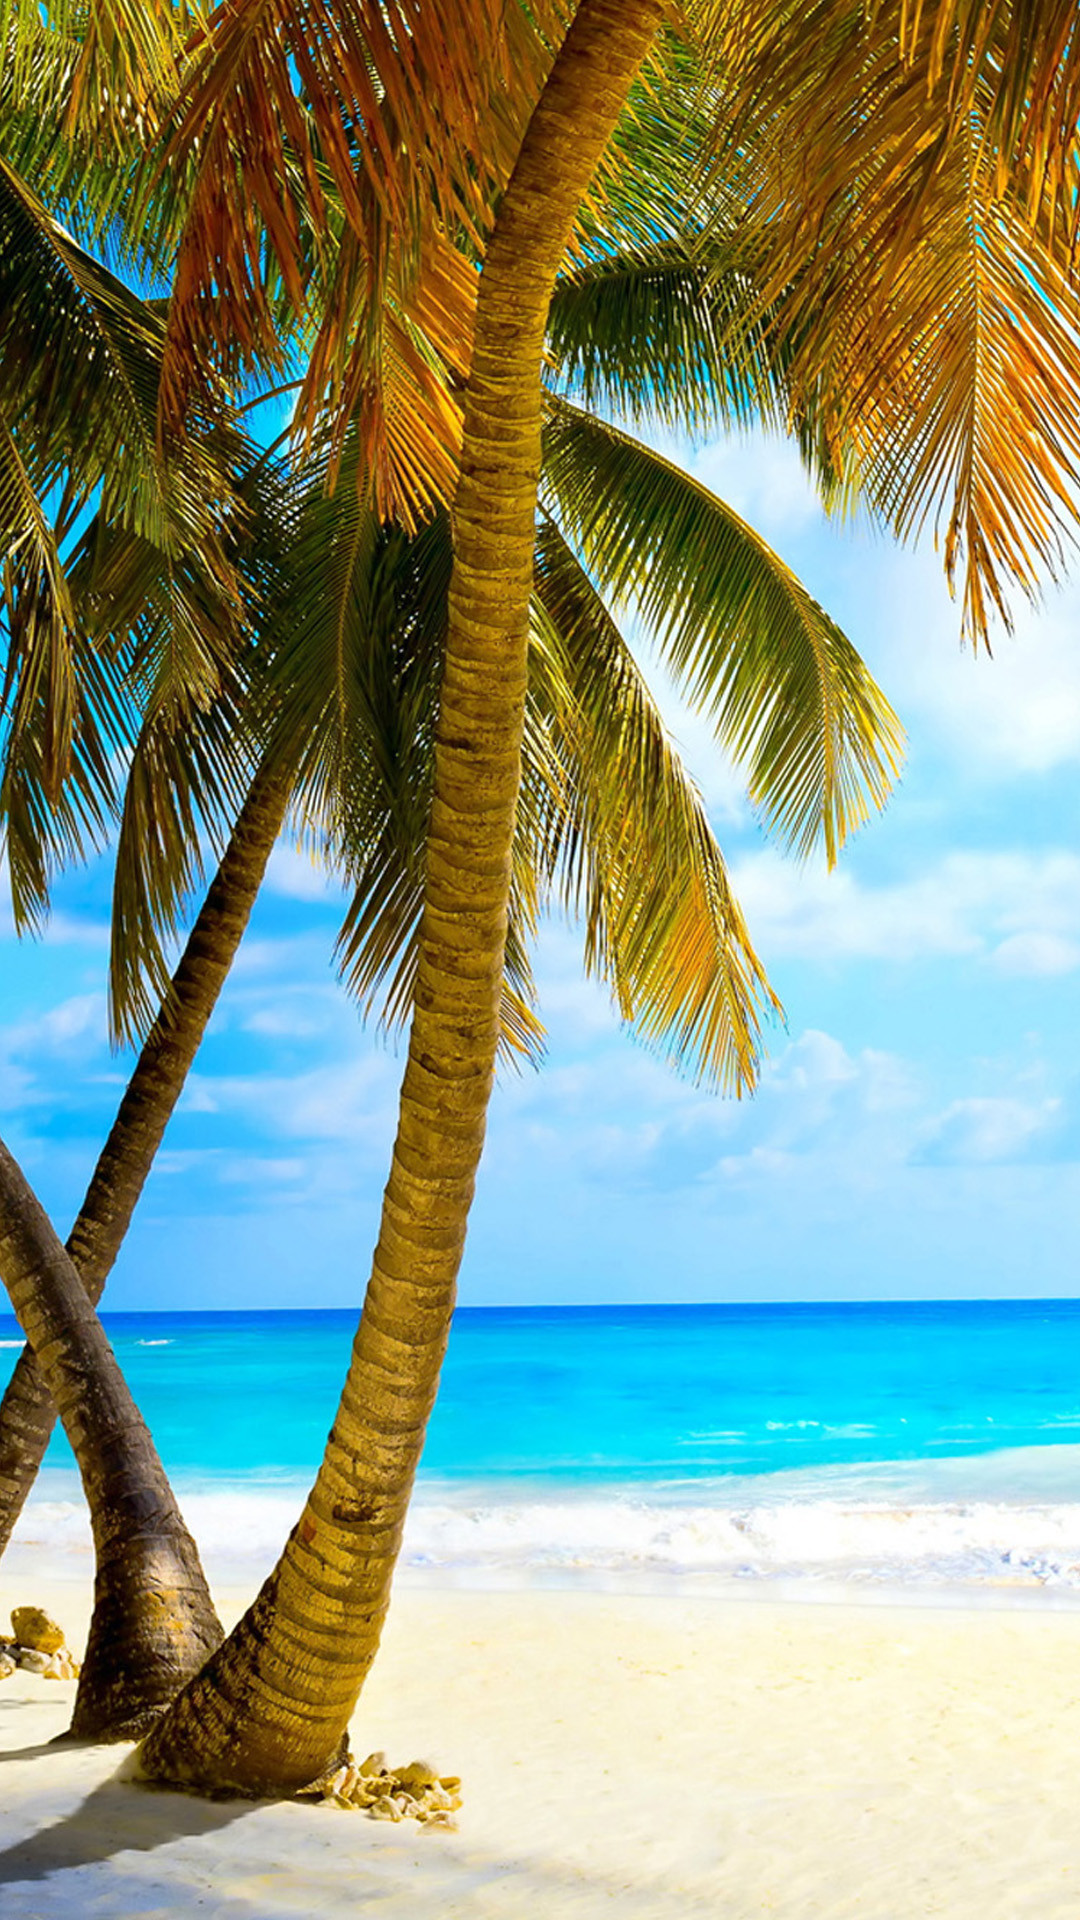 Download - Tropical Beach Wallpaper Phone - HD Wallpaper